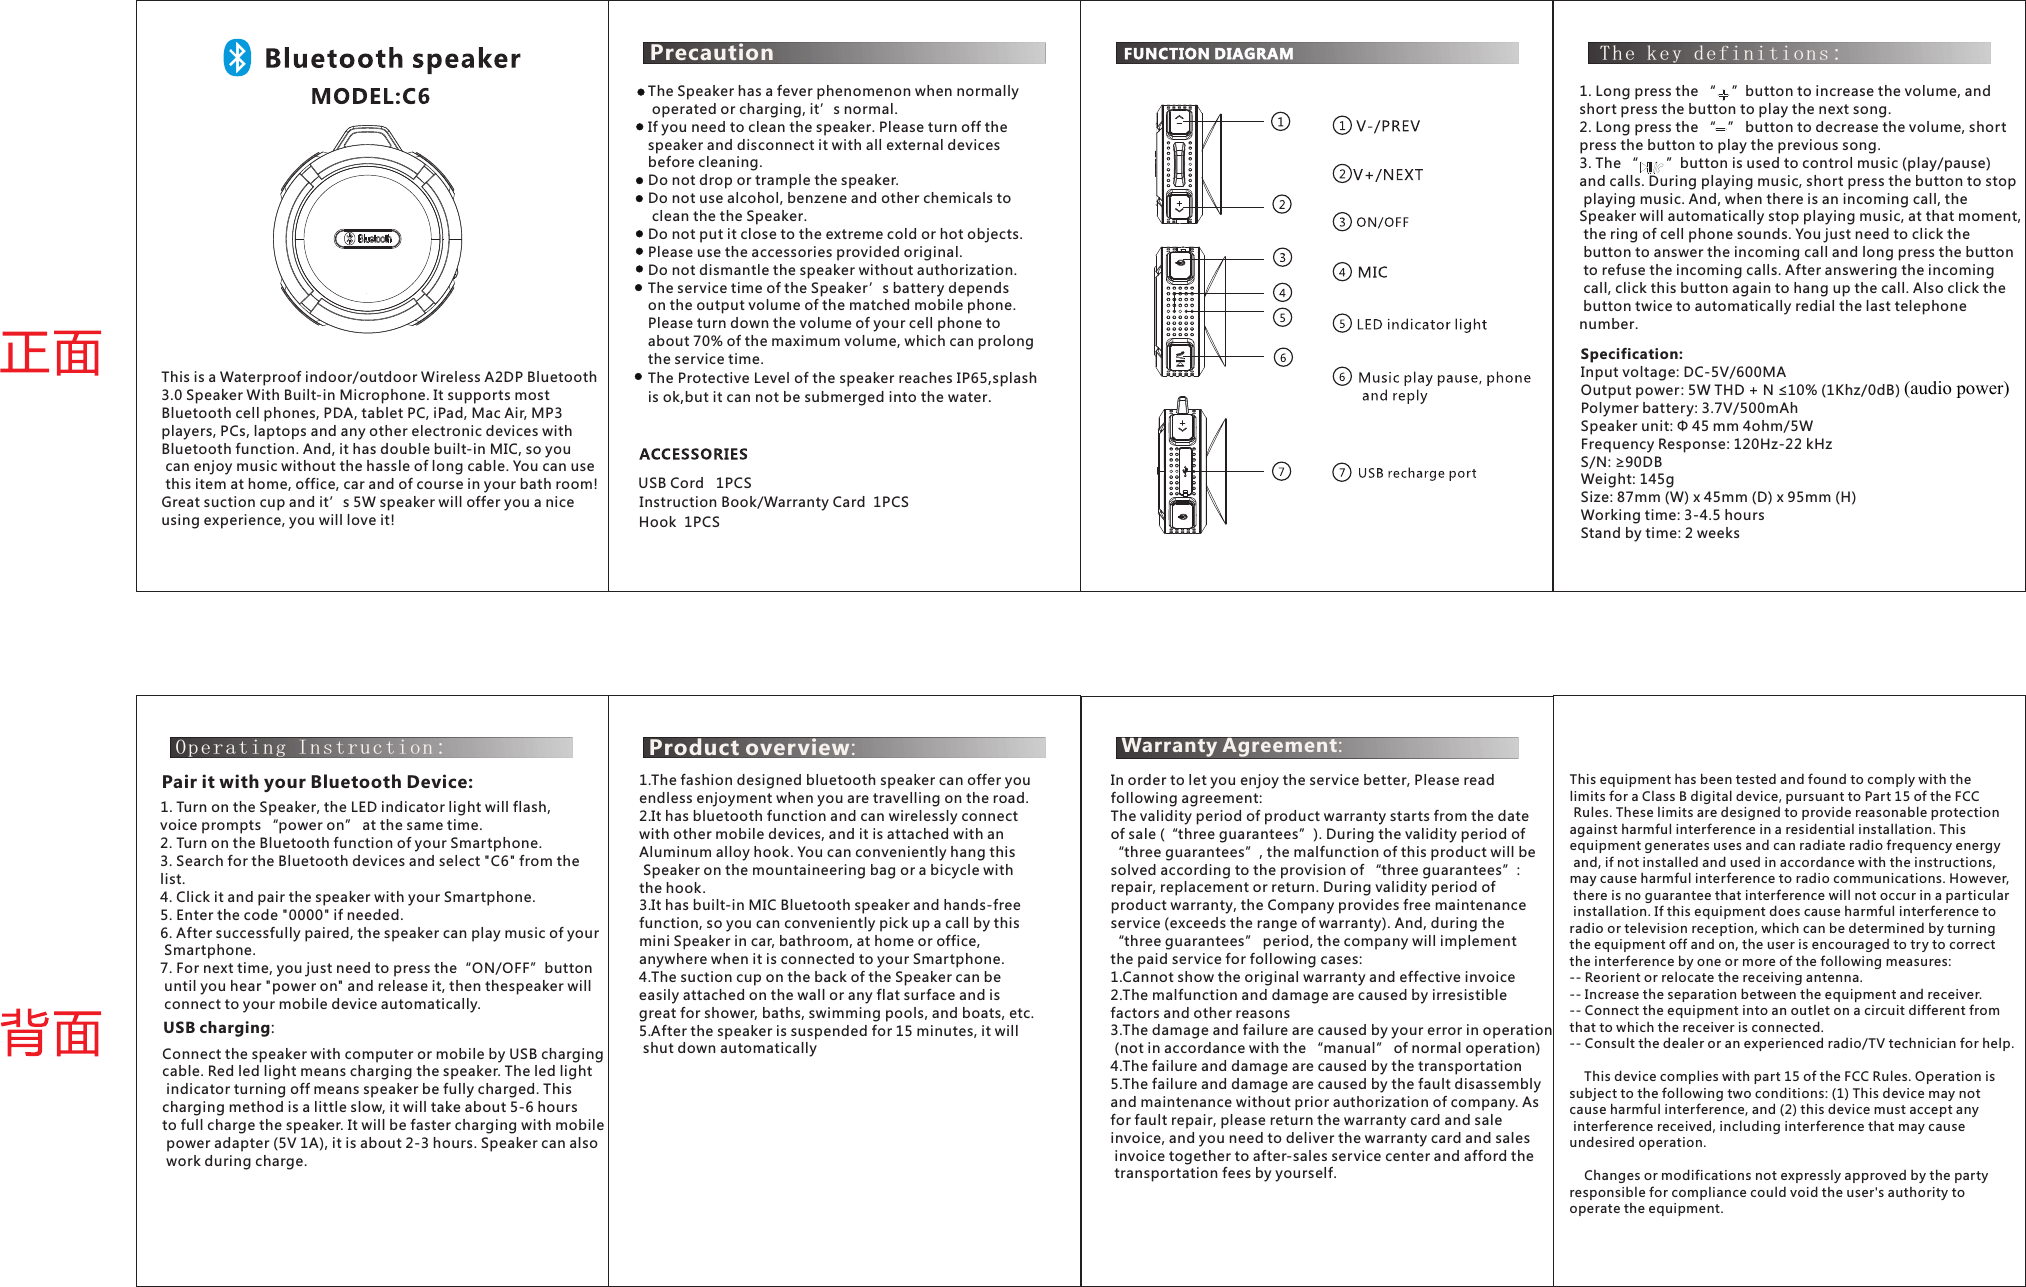 COMISO DIGITAL TECHNOLOGY C6 Bluetooth Speaker User Manual